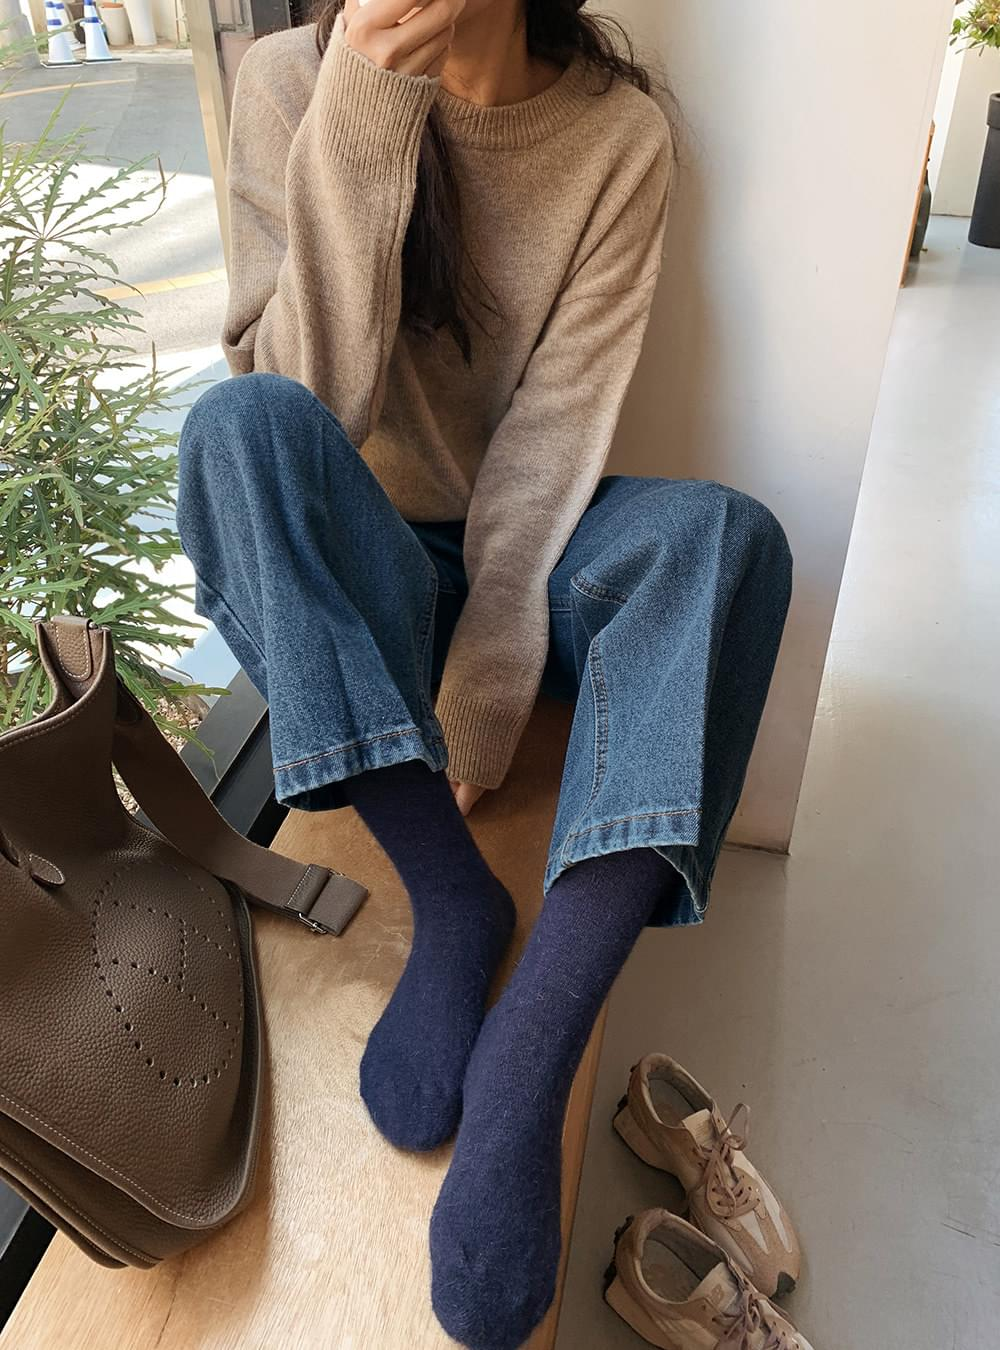 Angora Wool Knit Socks 襪子